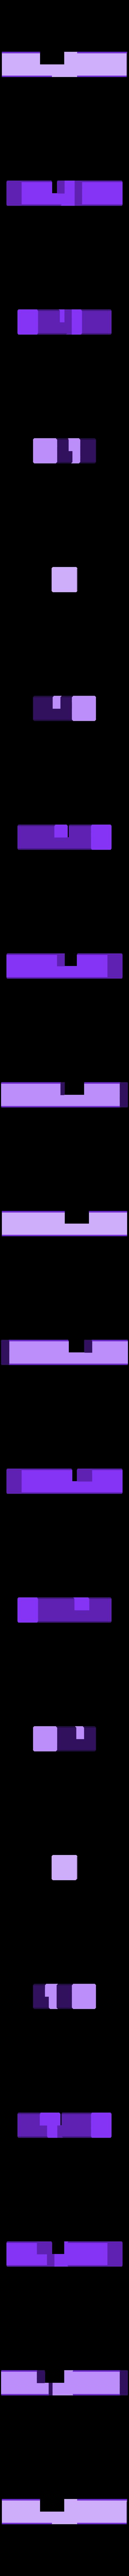 J.stl Download free STL file Mini Puzzle Puzzle • 3D printer model, Bdz37